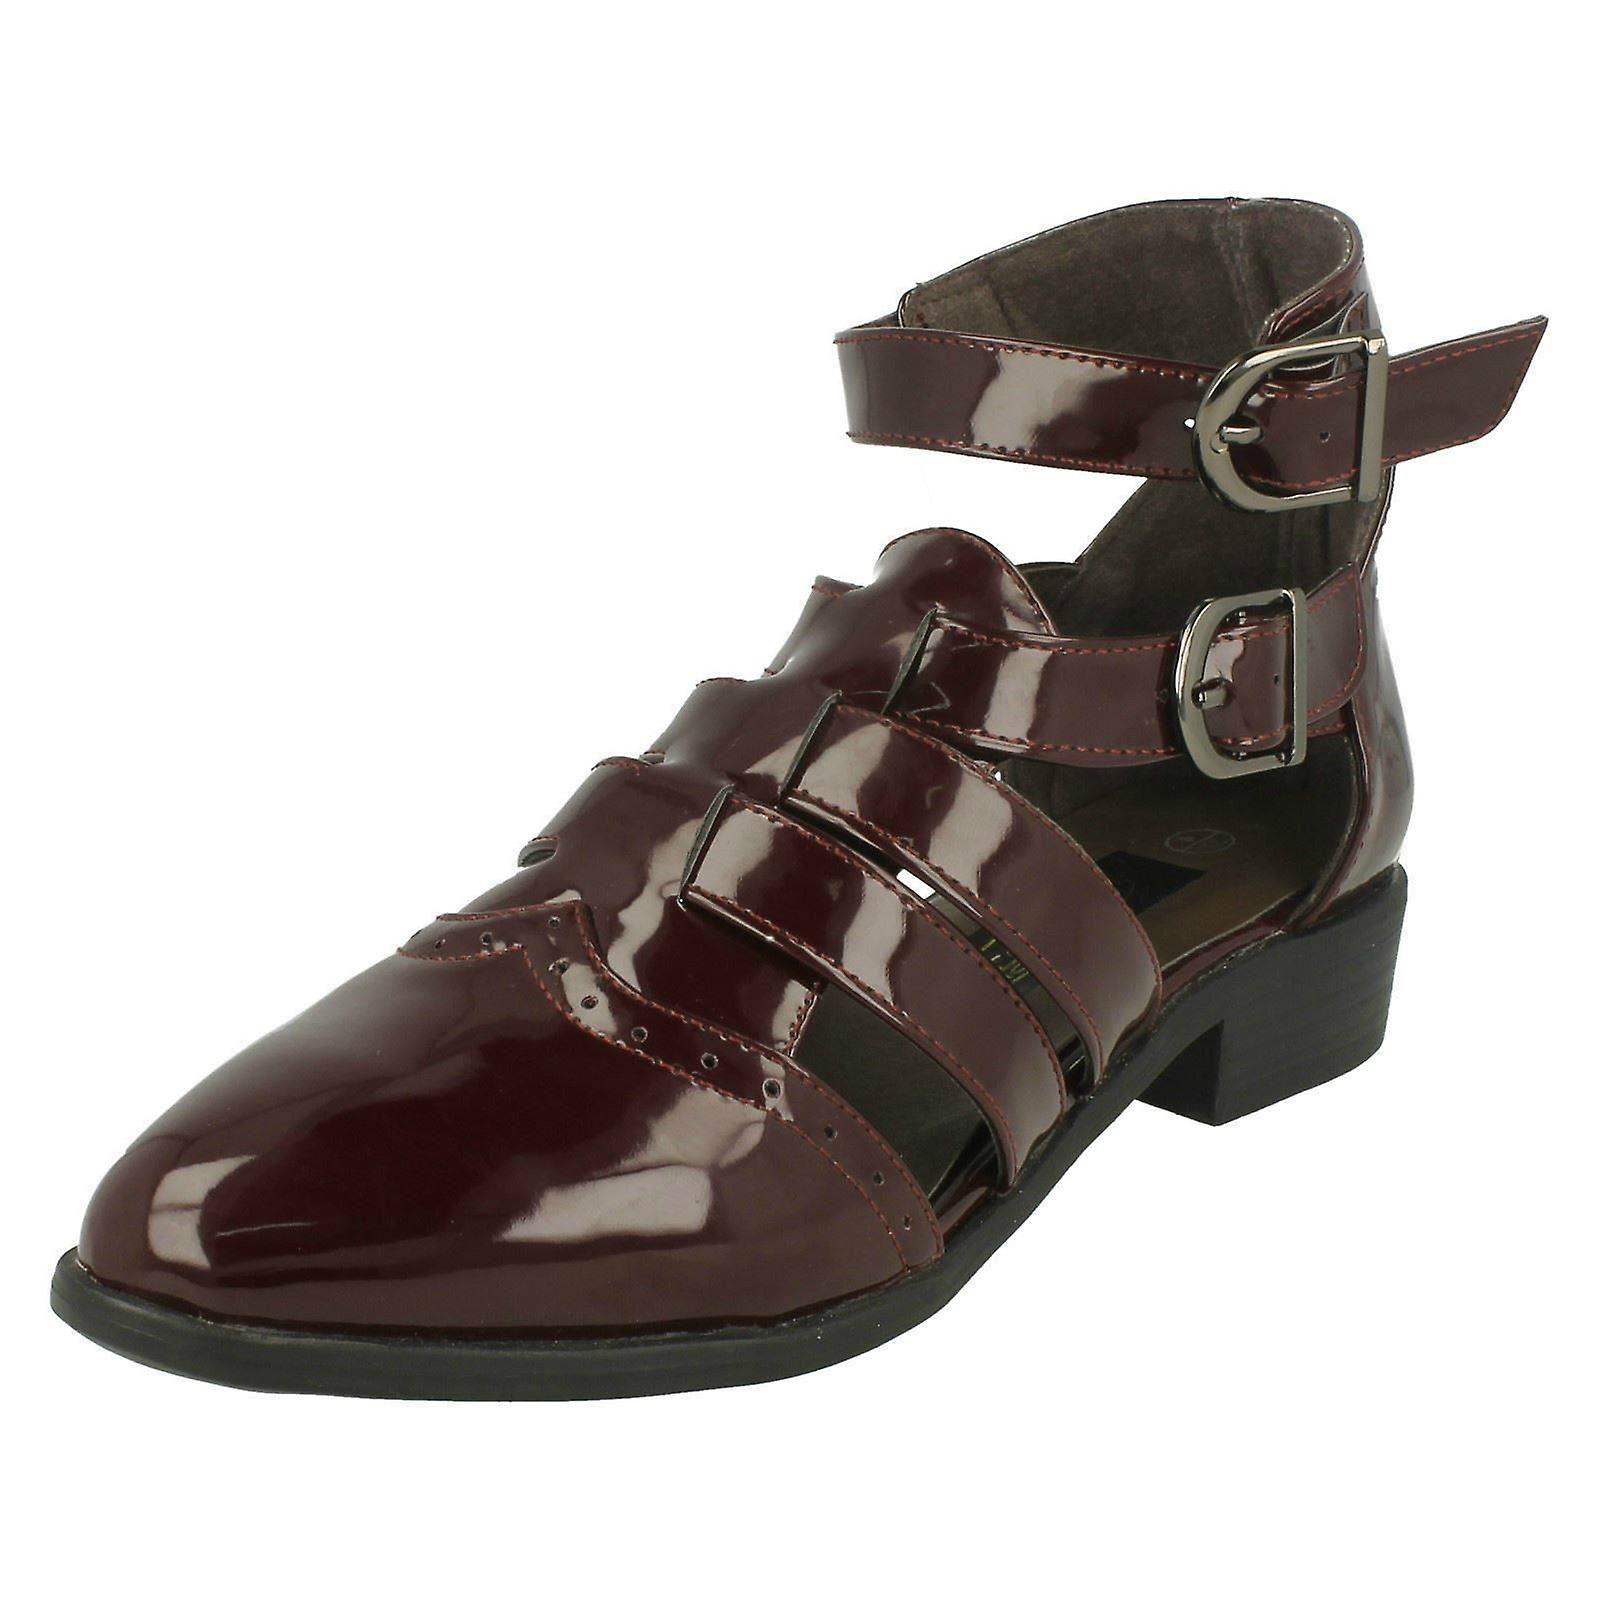 Ladies Spot Shoes On Strappy Shoes Spot 7c9ba0